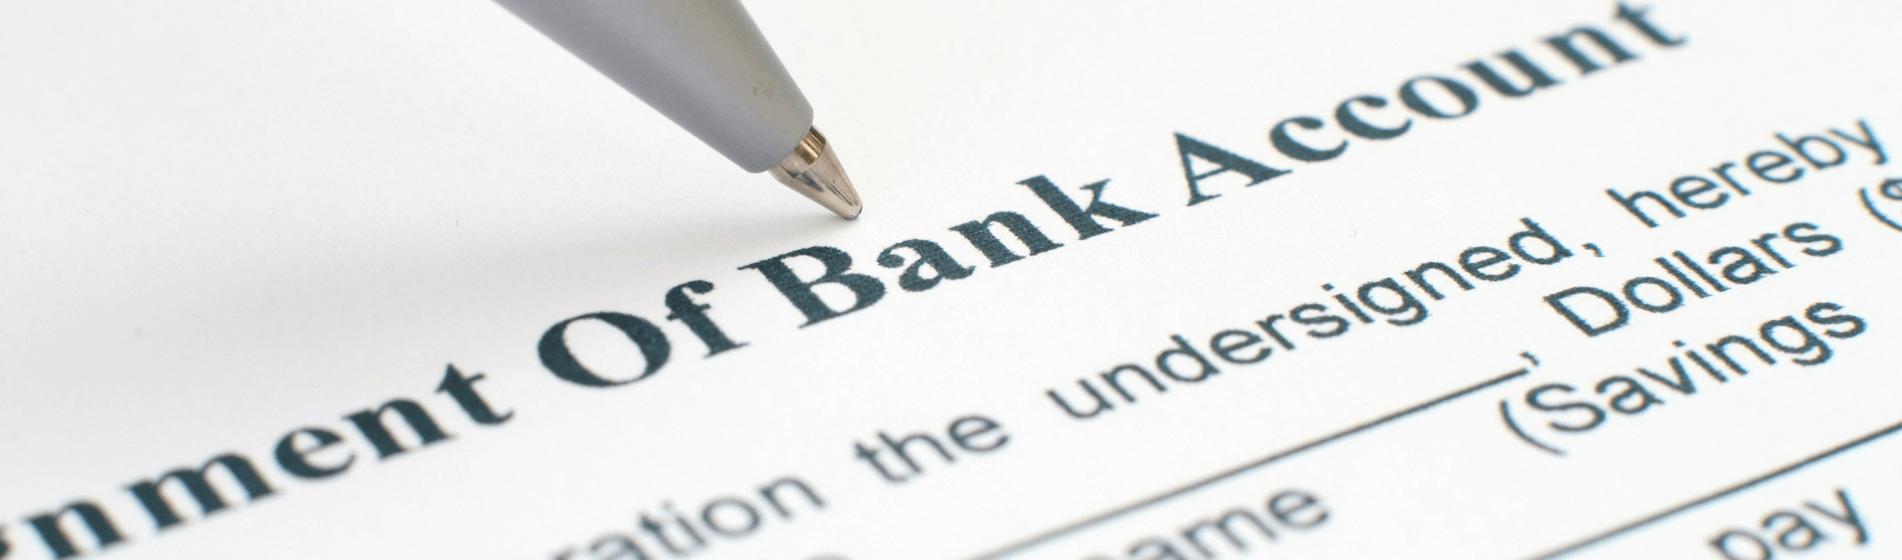 Why We Closed Our Lichtenstein Bank Account